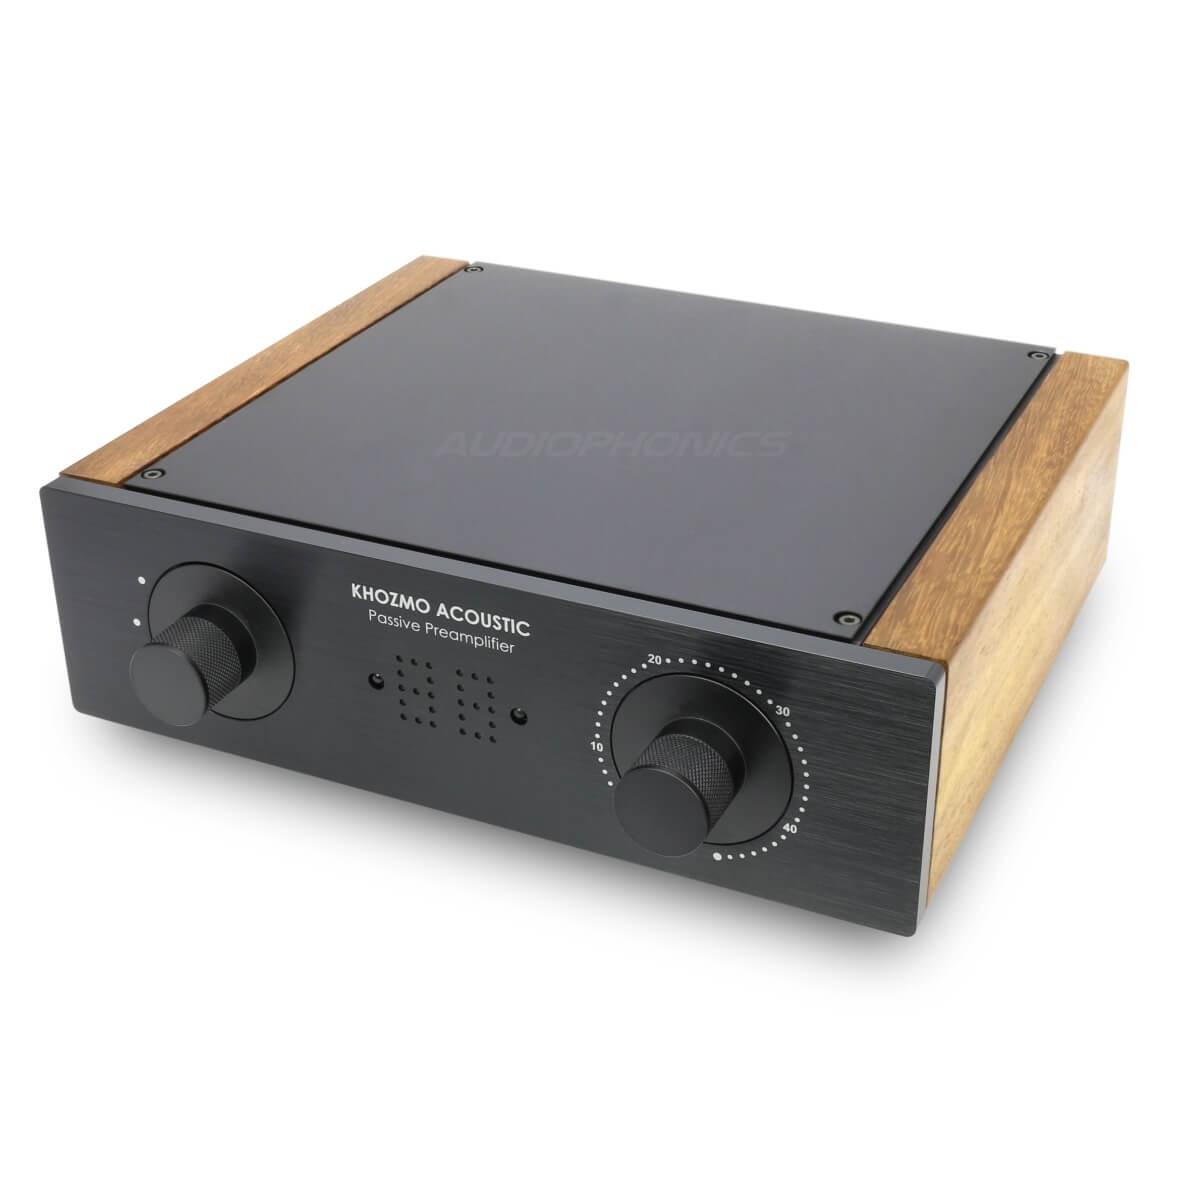 KHOZMO ACOUSTIC Volume Controller / Source Selector 10K + Remote Control Black